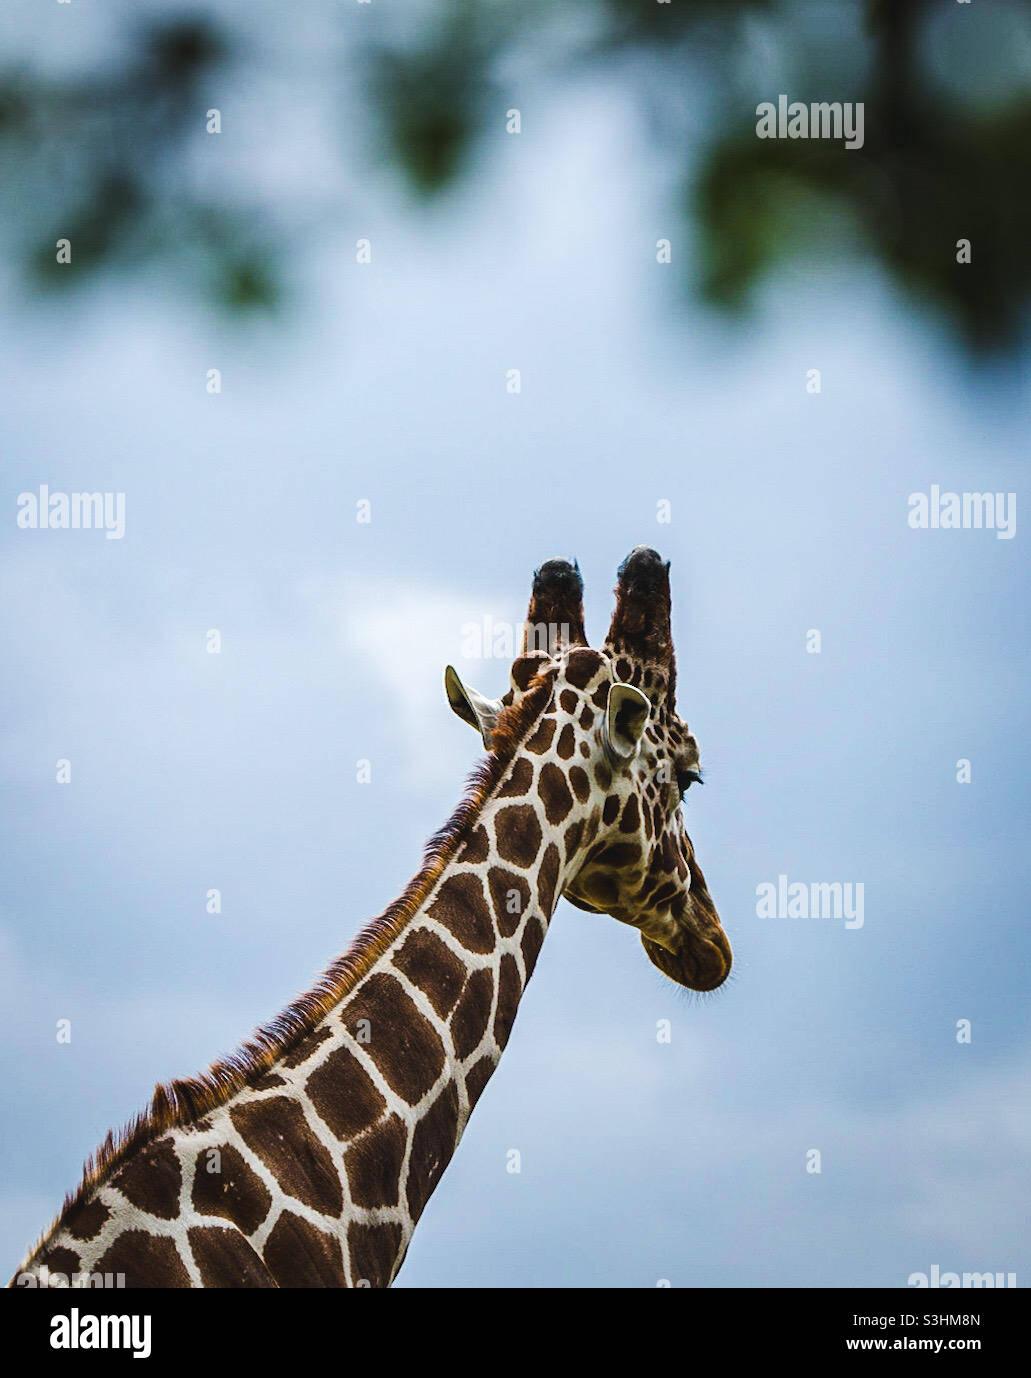 Girafe Banque D'Images